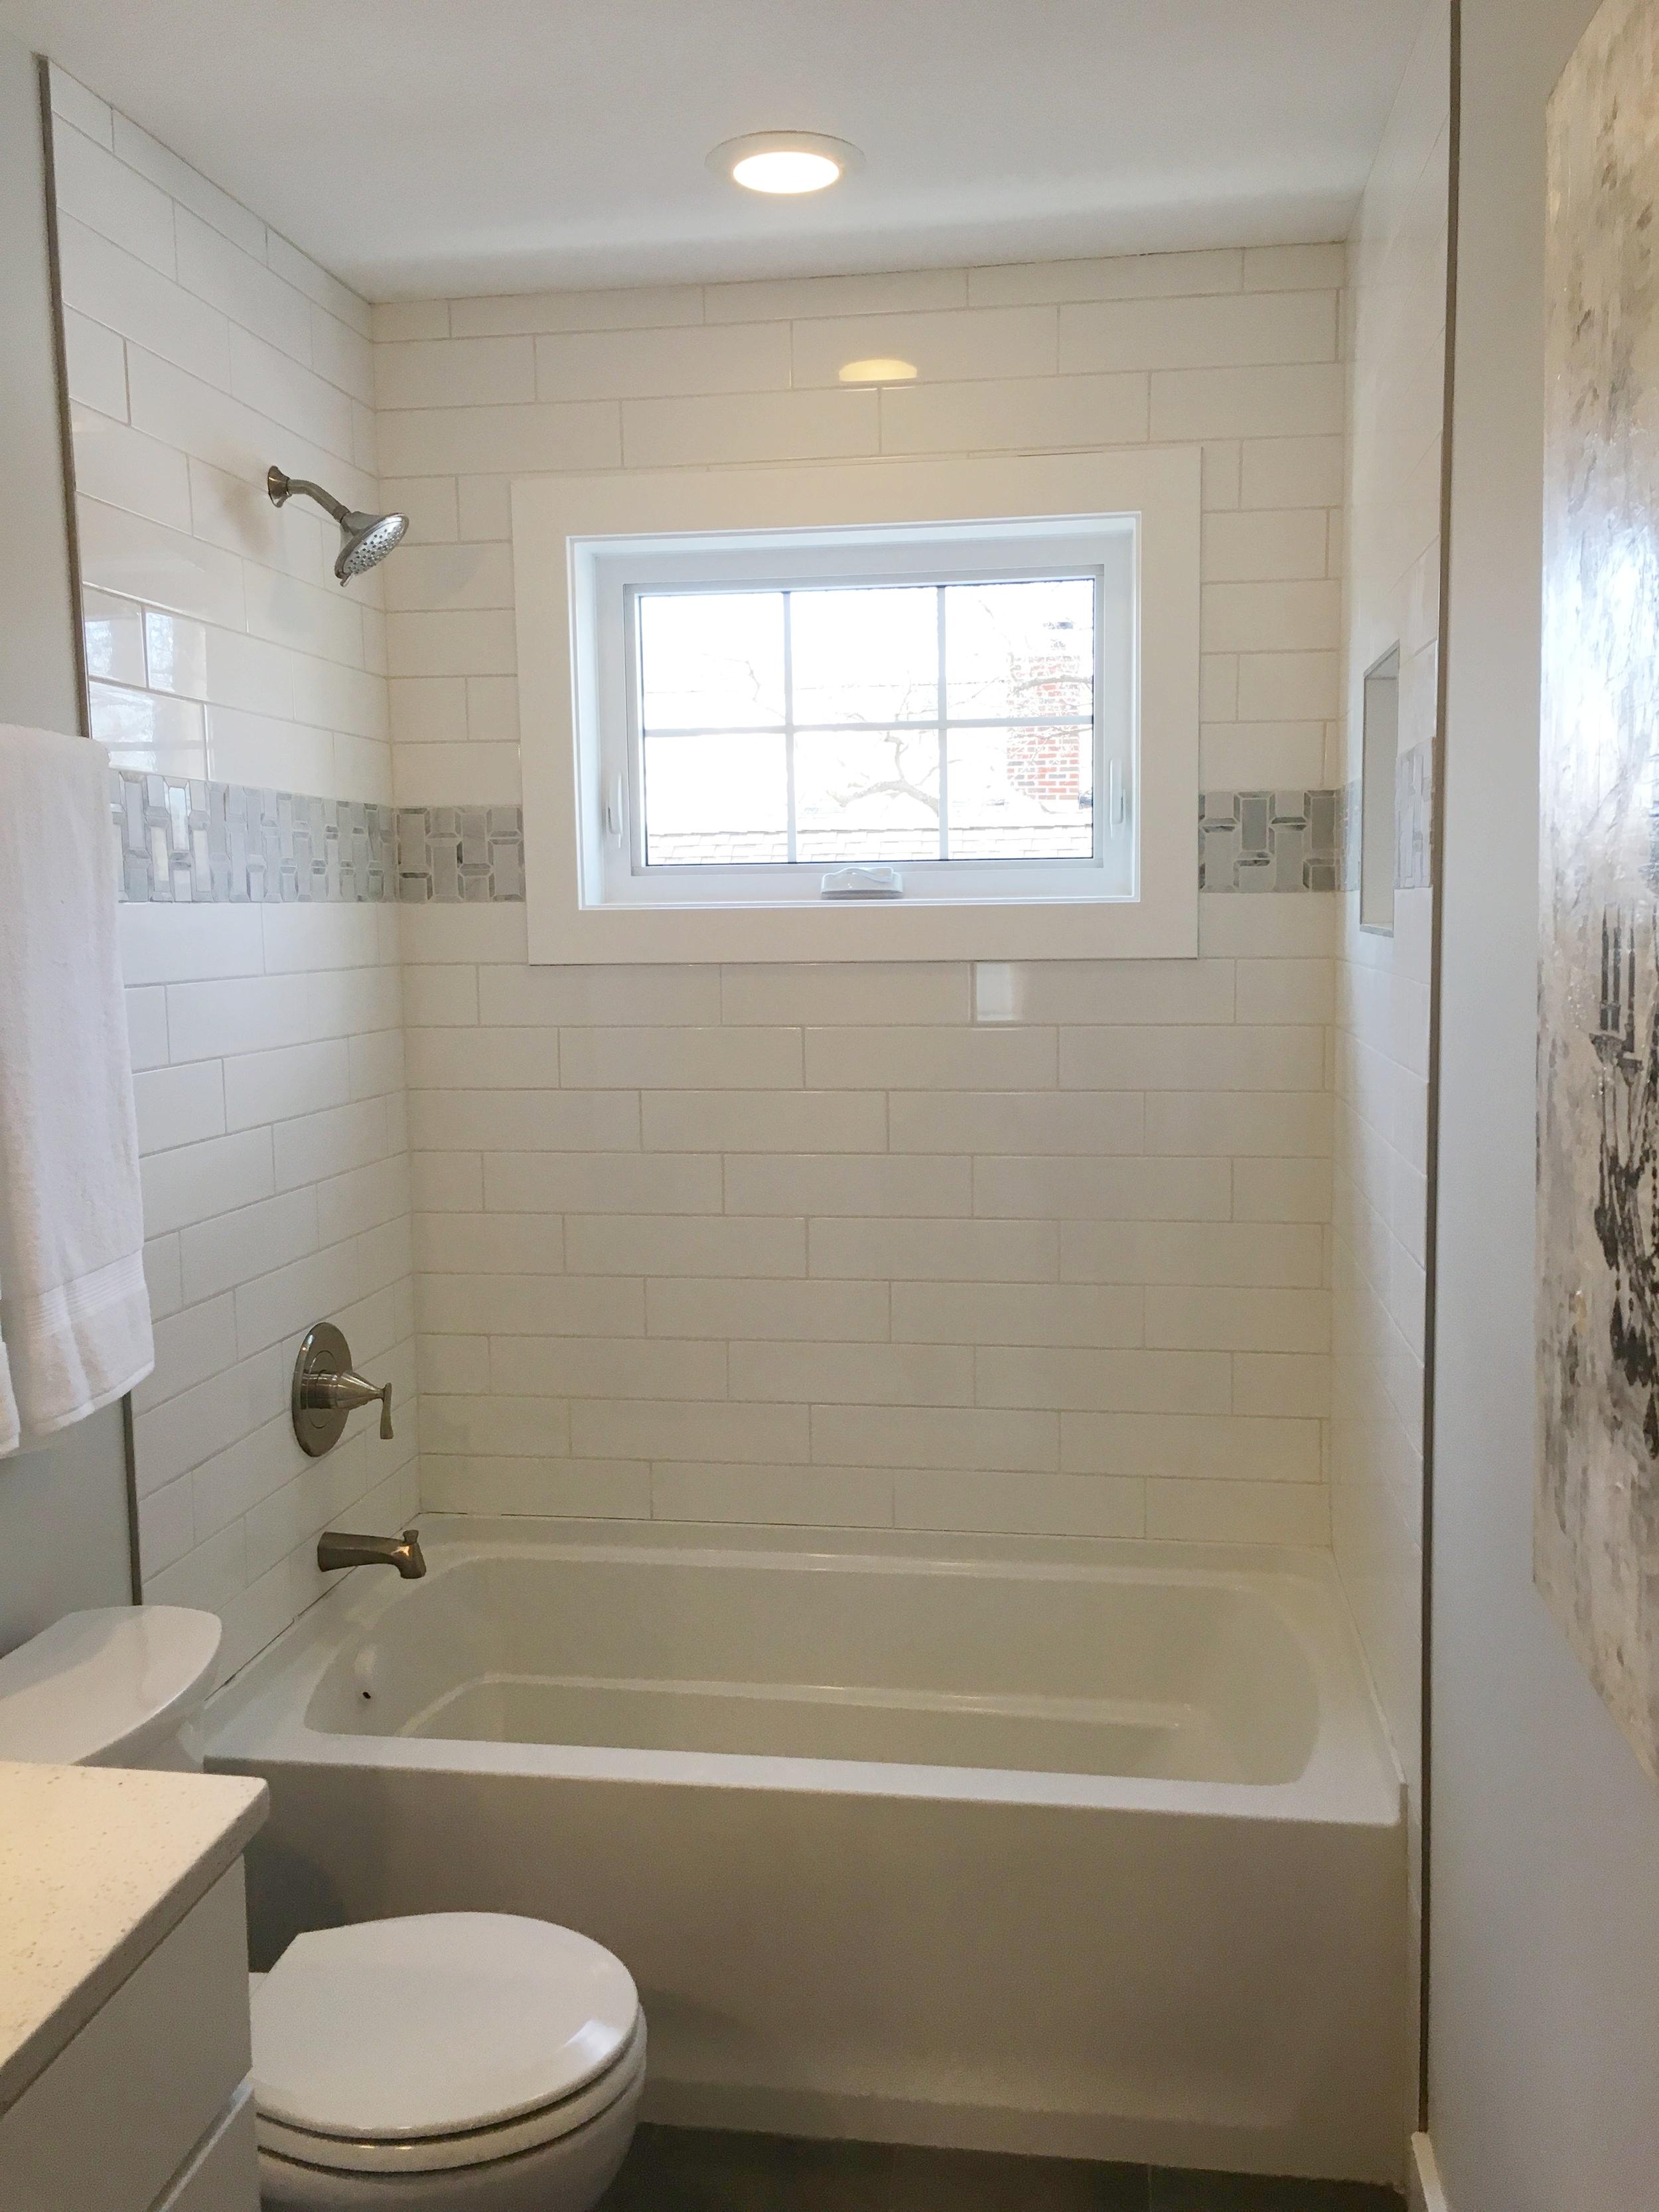 Enameled woodwork around a shower window